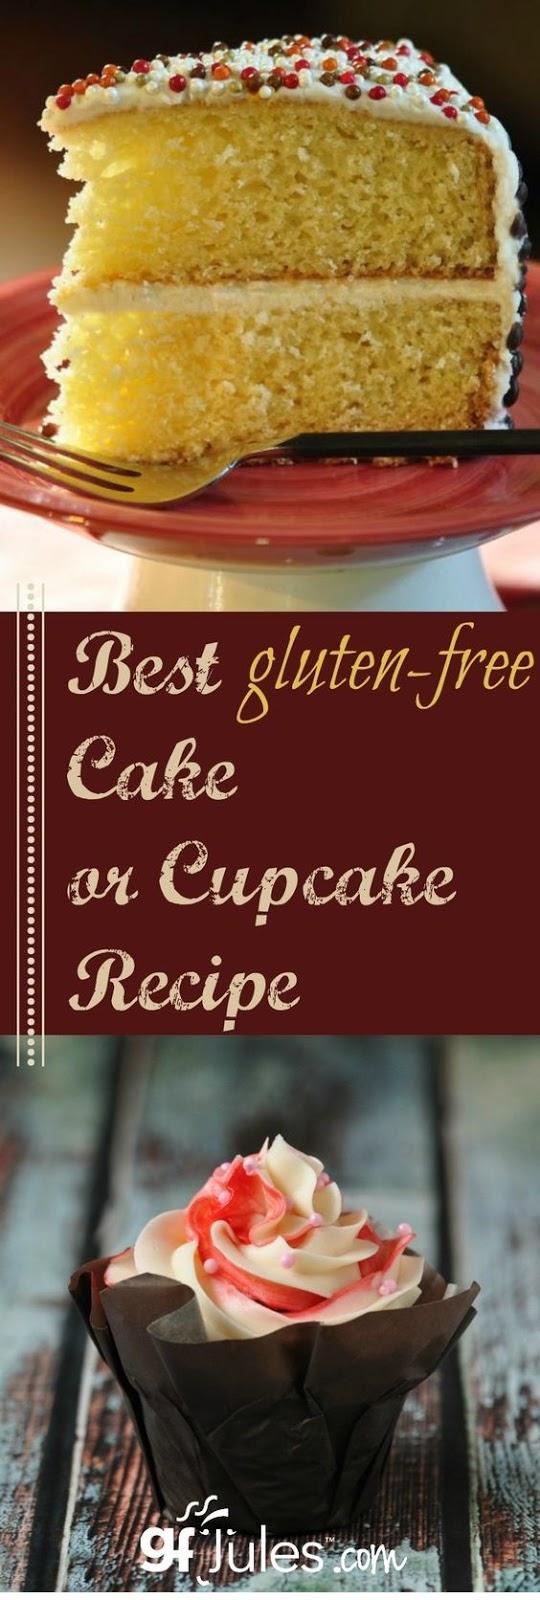 The Best Gluten Free Cake Recipe